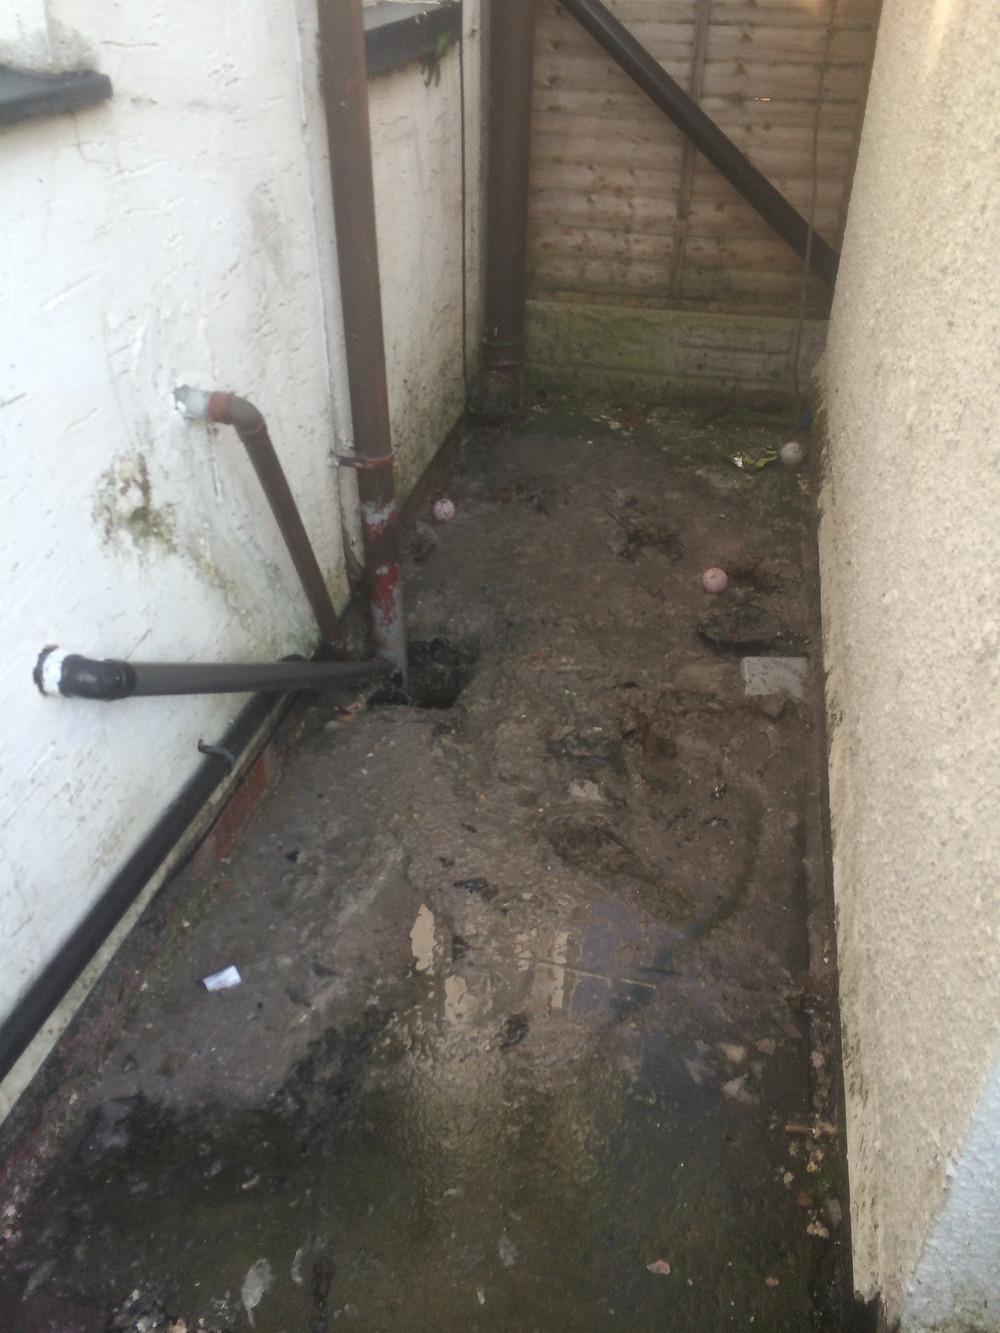 blocked drain in Preston, drain blockage cleared fast by JCS Drainage Preston. Need help with blocked drainage in Preston, Call us free on 08001693202